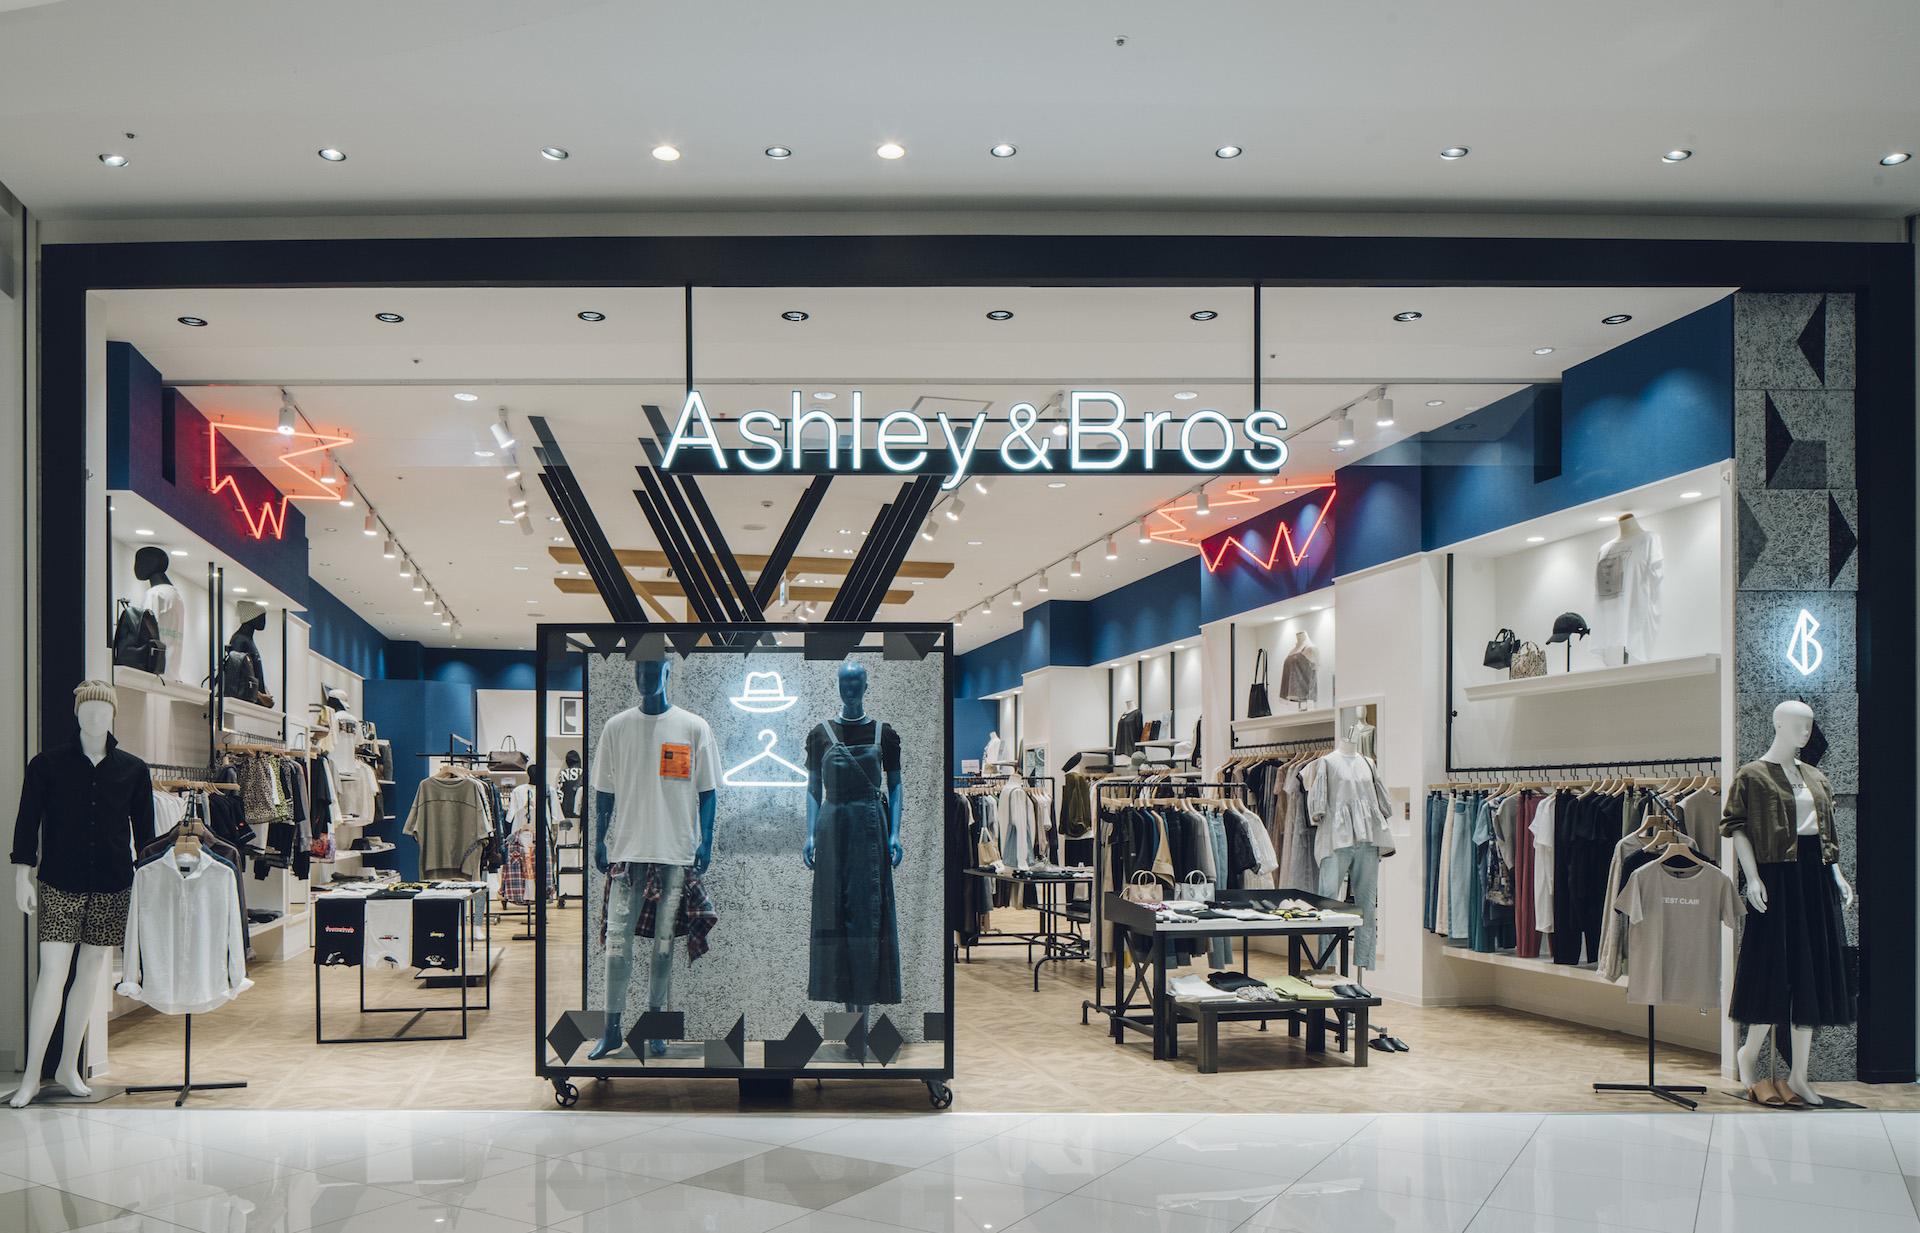 Ashley&Bros 津南店